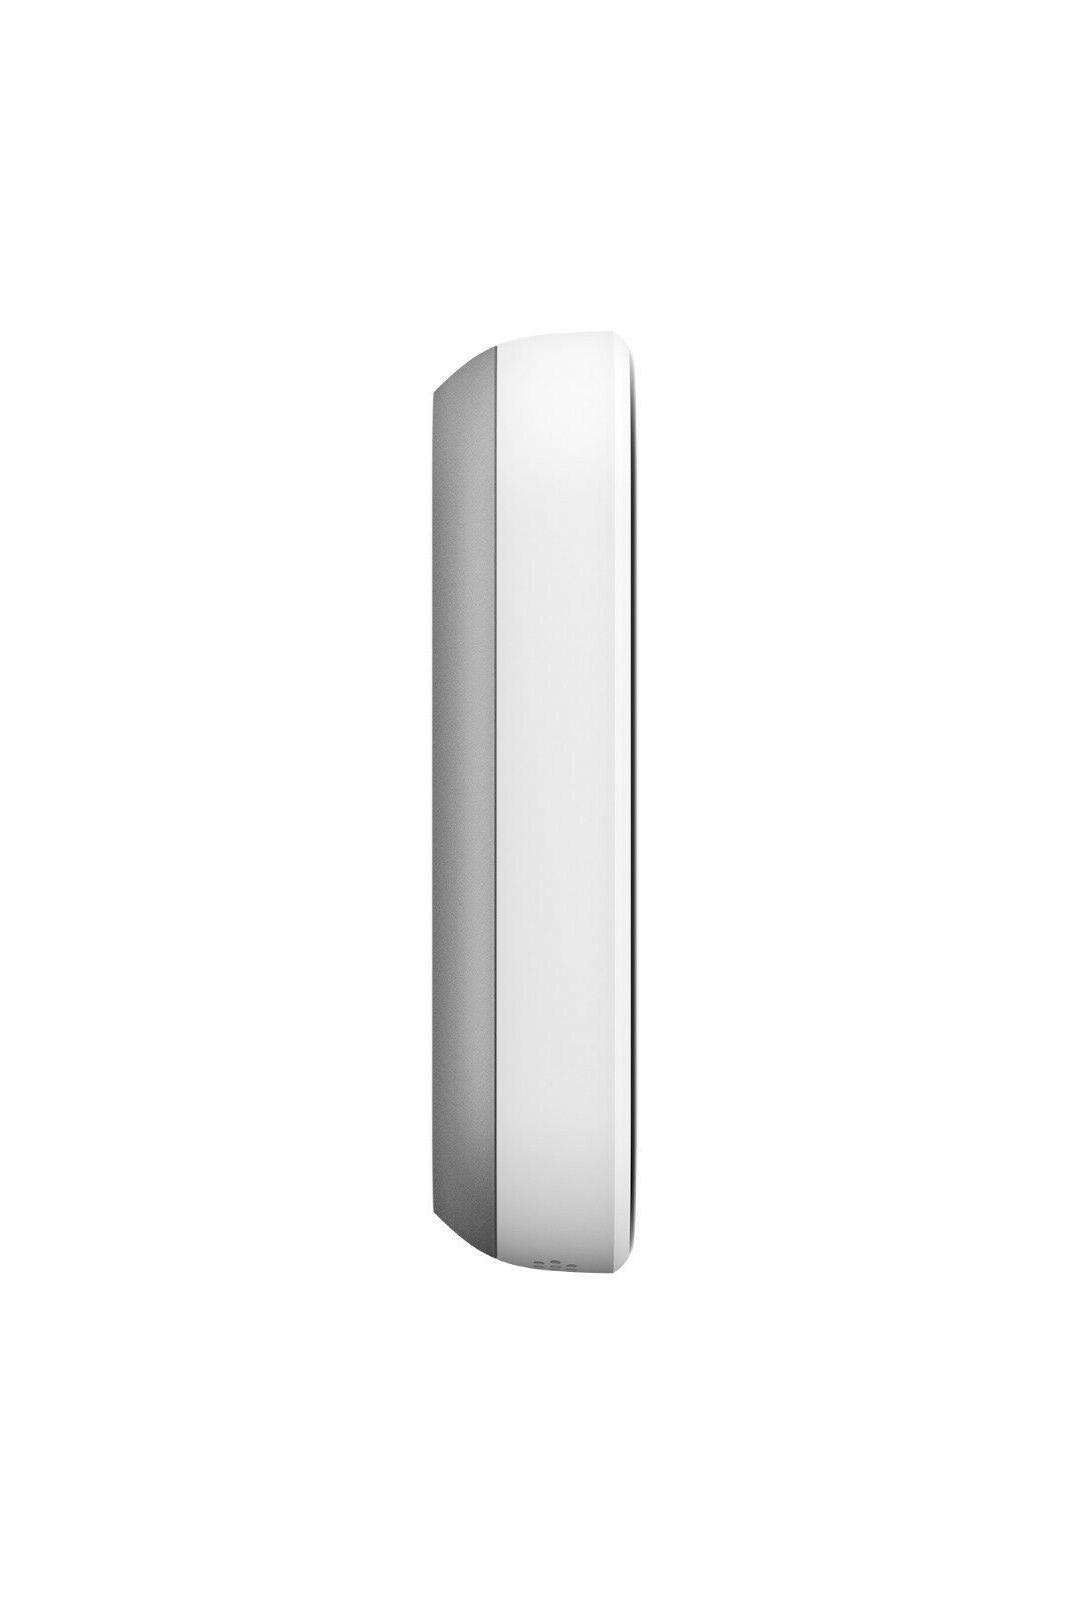 Google Wi-Fi Doorbell